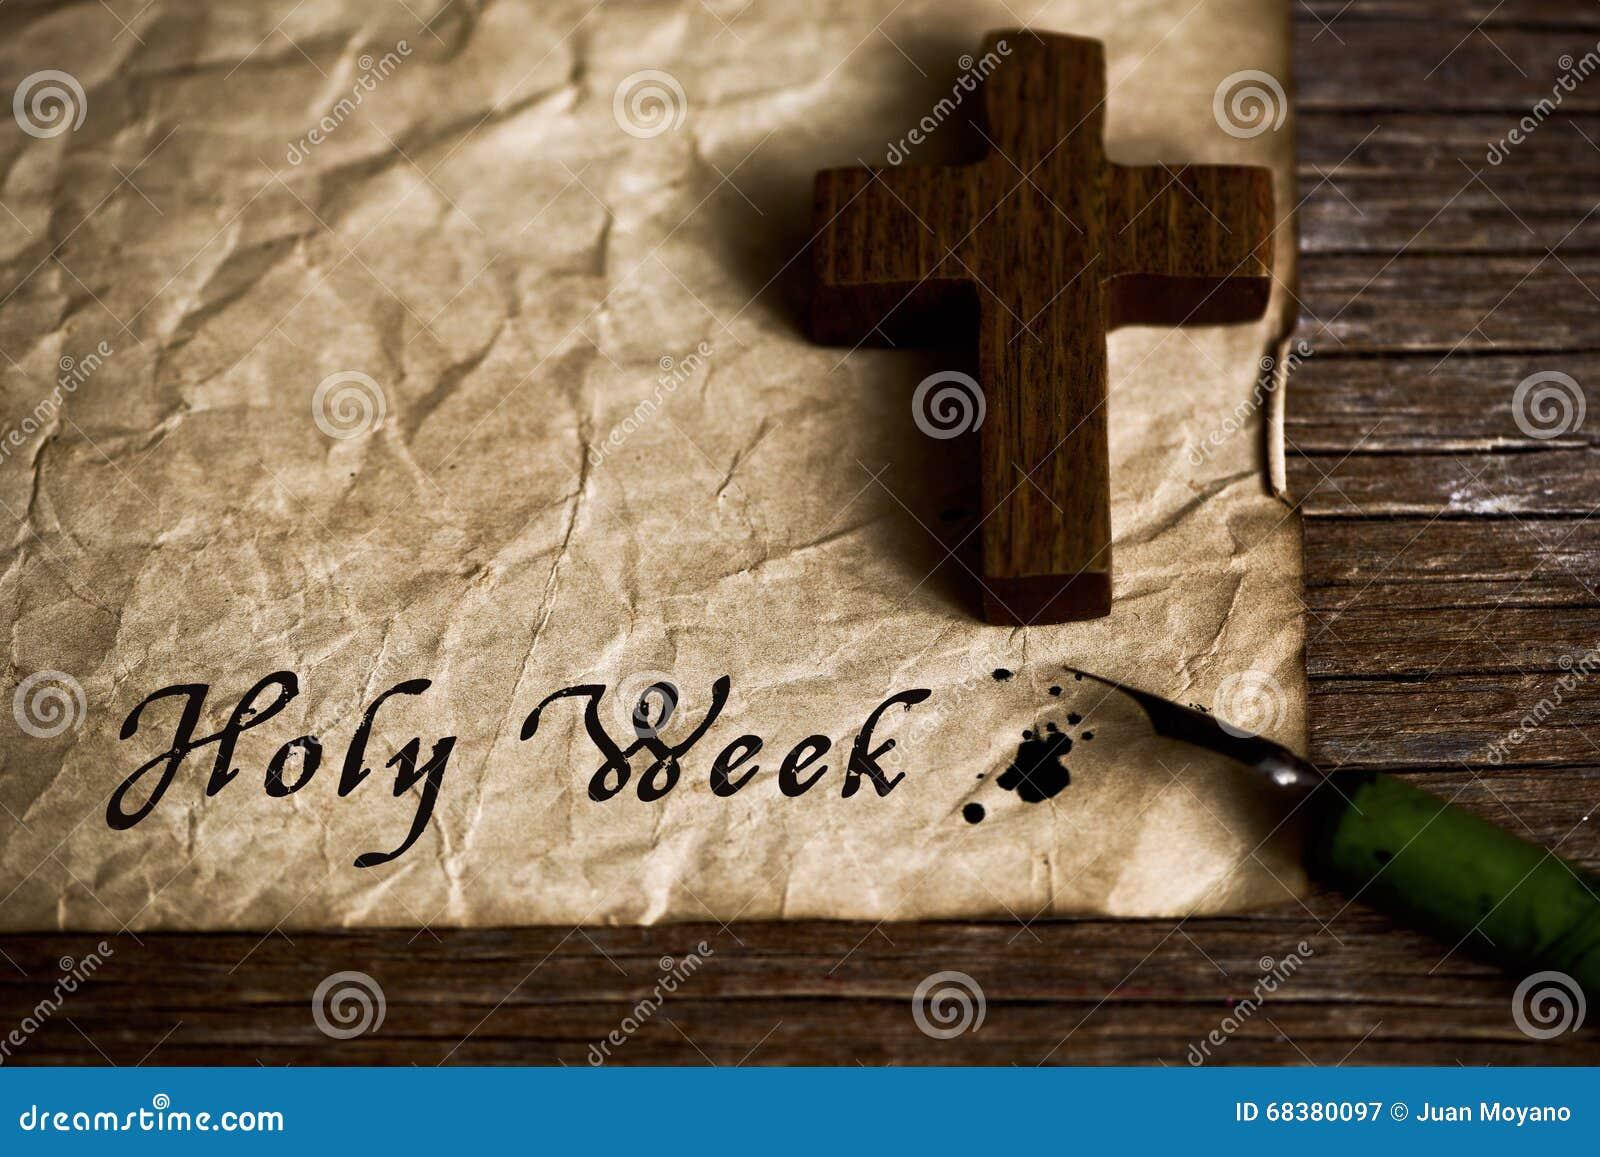 Semana santa cristiana de madera de la cruz y del texto